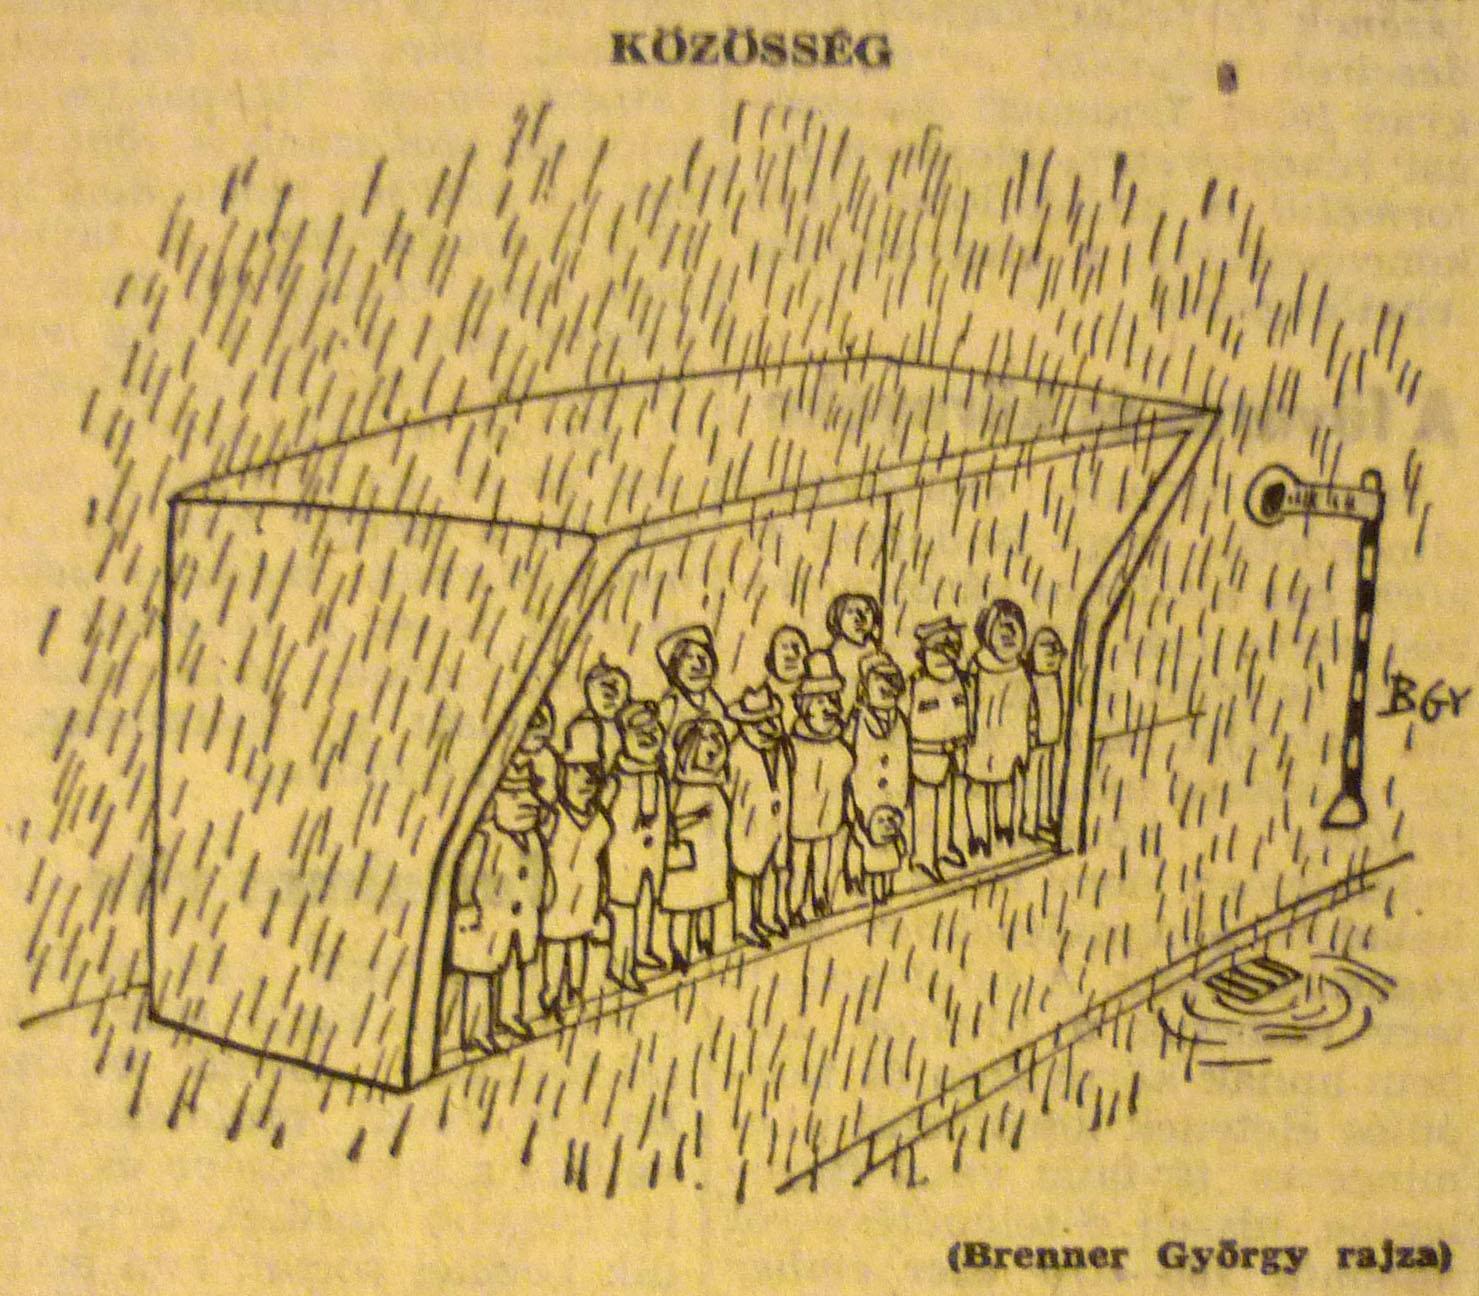 kozosseg-197002-karikatura-magyarnemzet.jpg